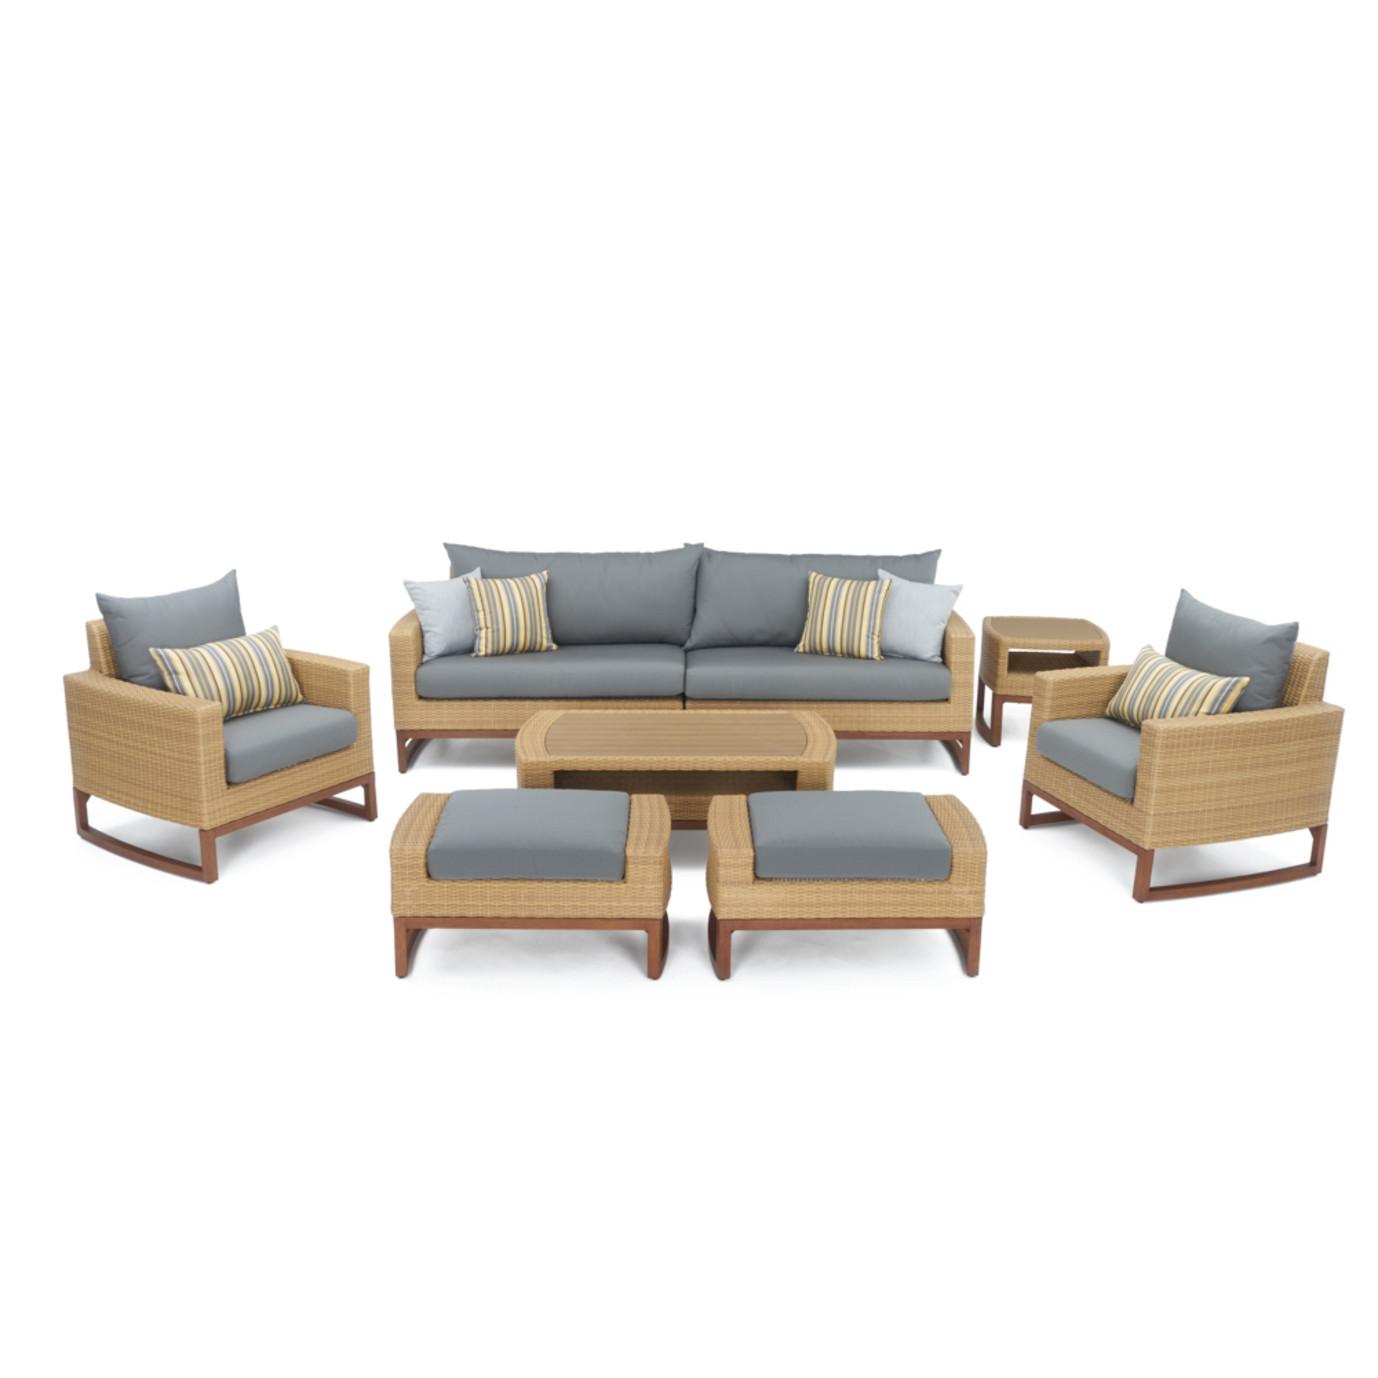 Milea™ 8pc Deep Seating Set - Charcoal Grey